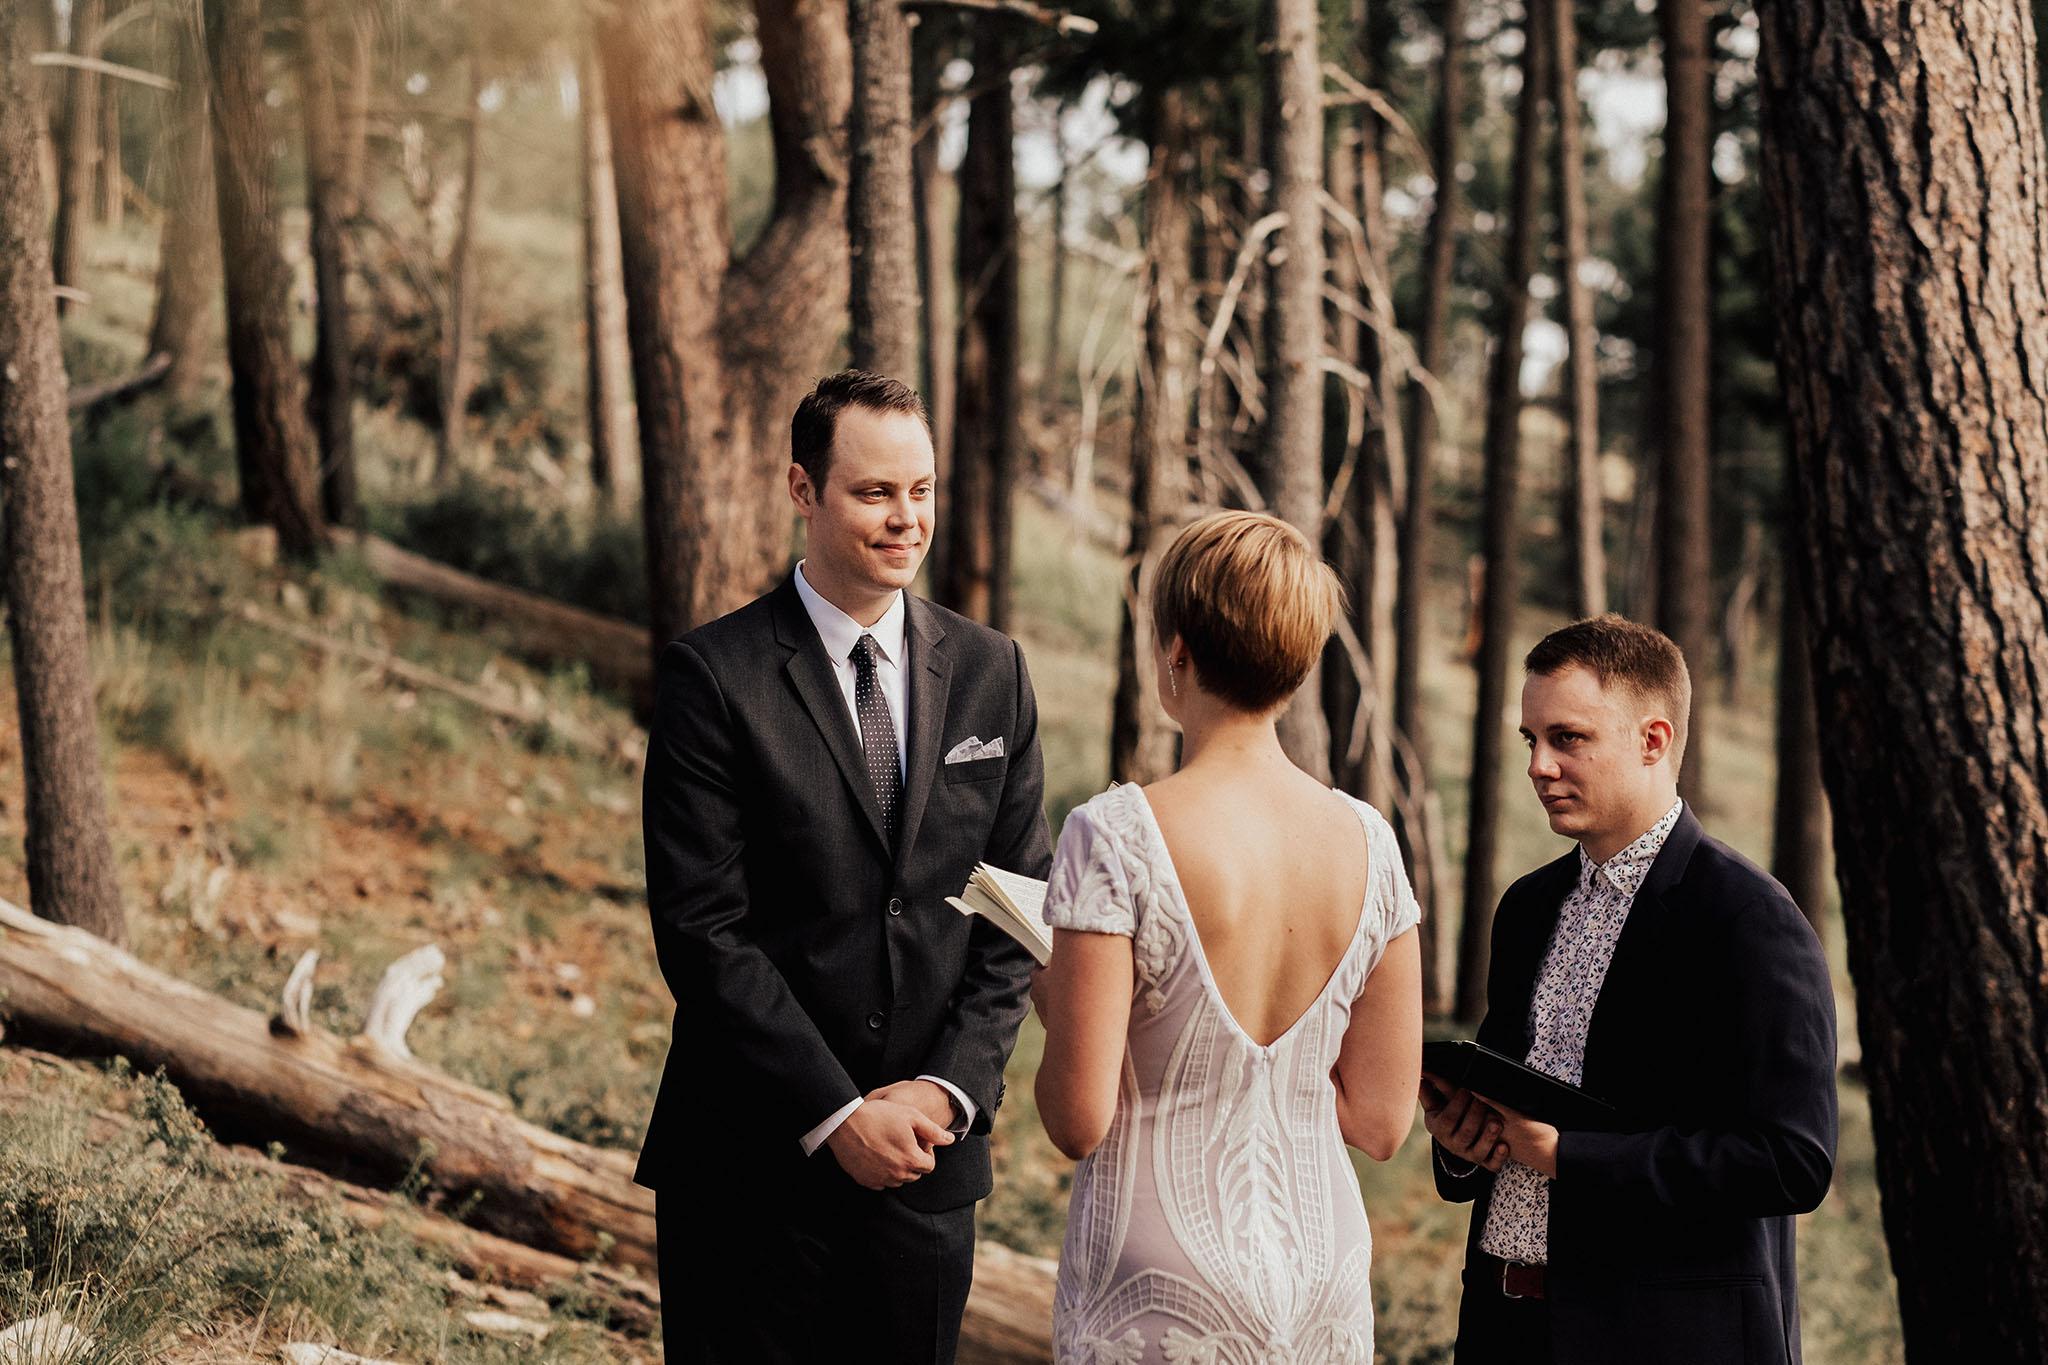 Arizona-Intimate-Elopement-Adventure-Photographer-Mount-Lemmon (9).jpg